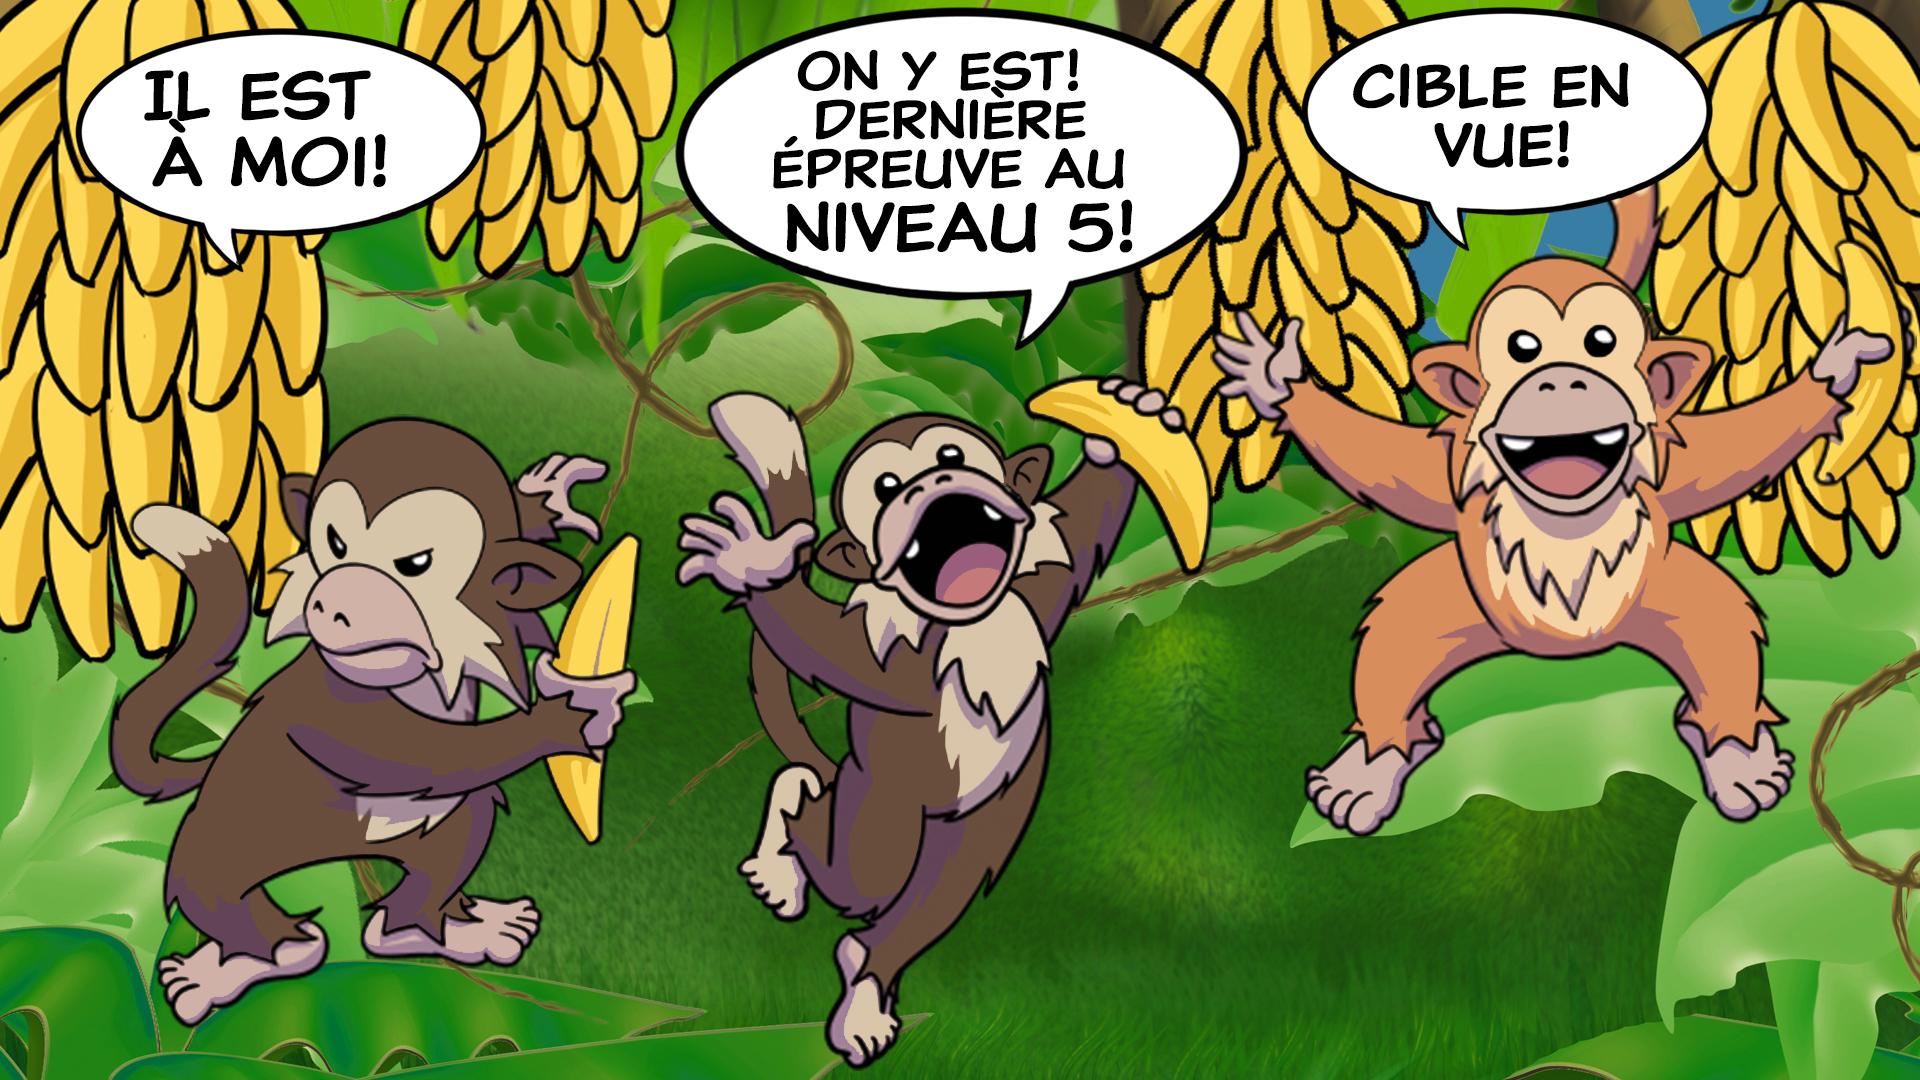 biki-lvl5-editgate-french